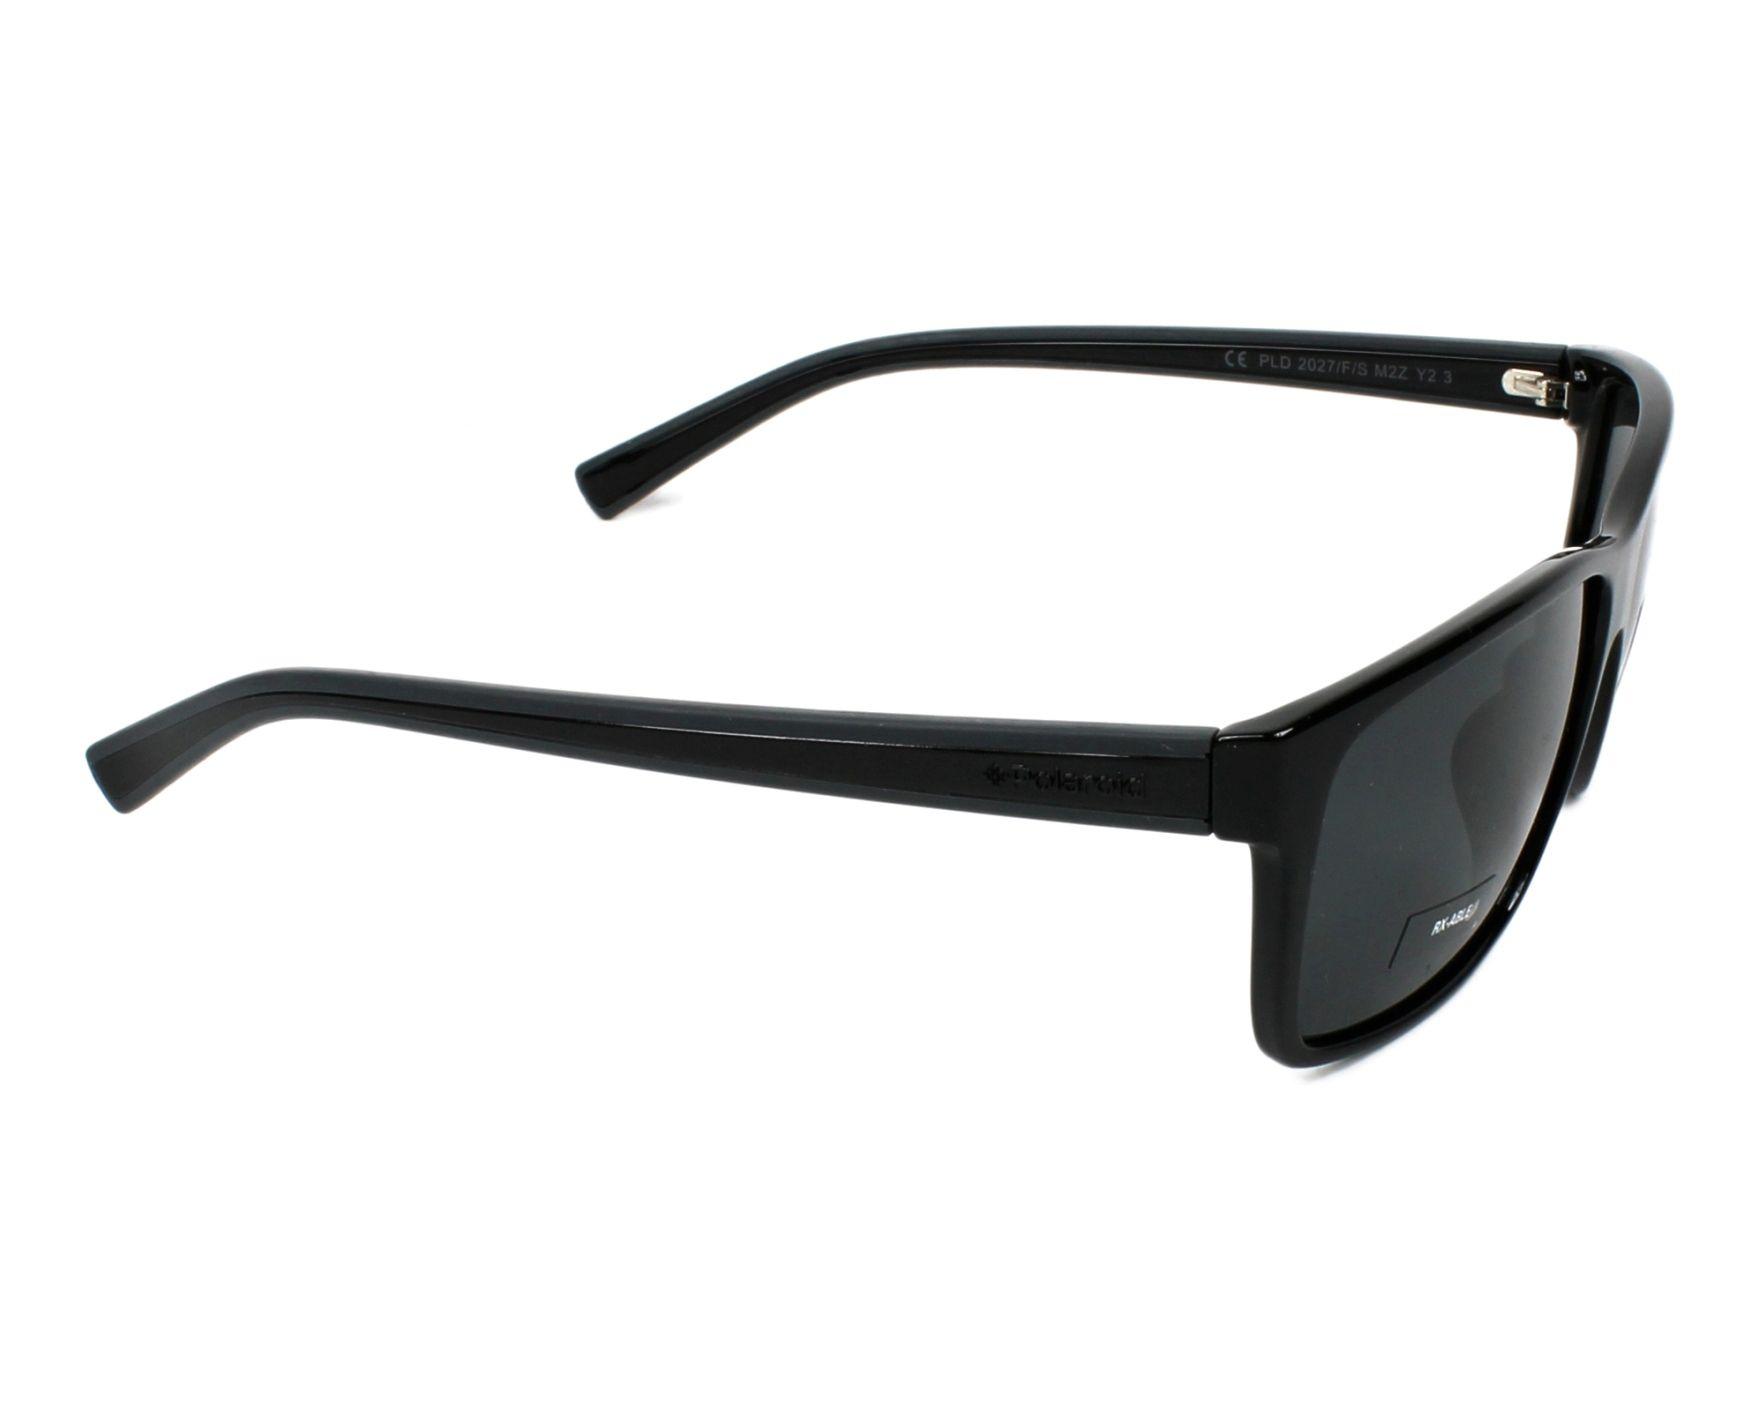 thumbnail Sunglasses Polaroid PLD-2027-FS M2Z Y2 - Black Black side view a7eb7d2622d9d